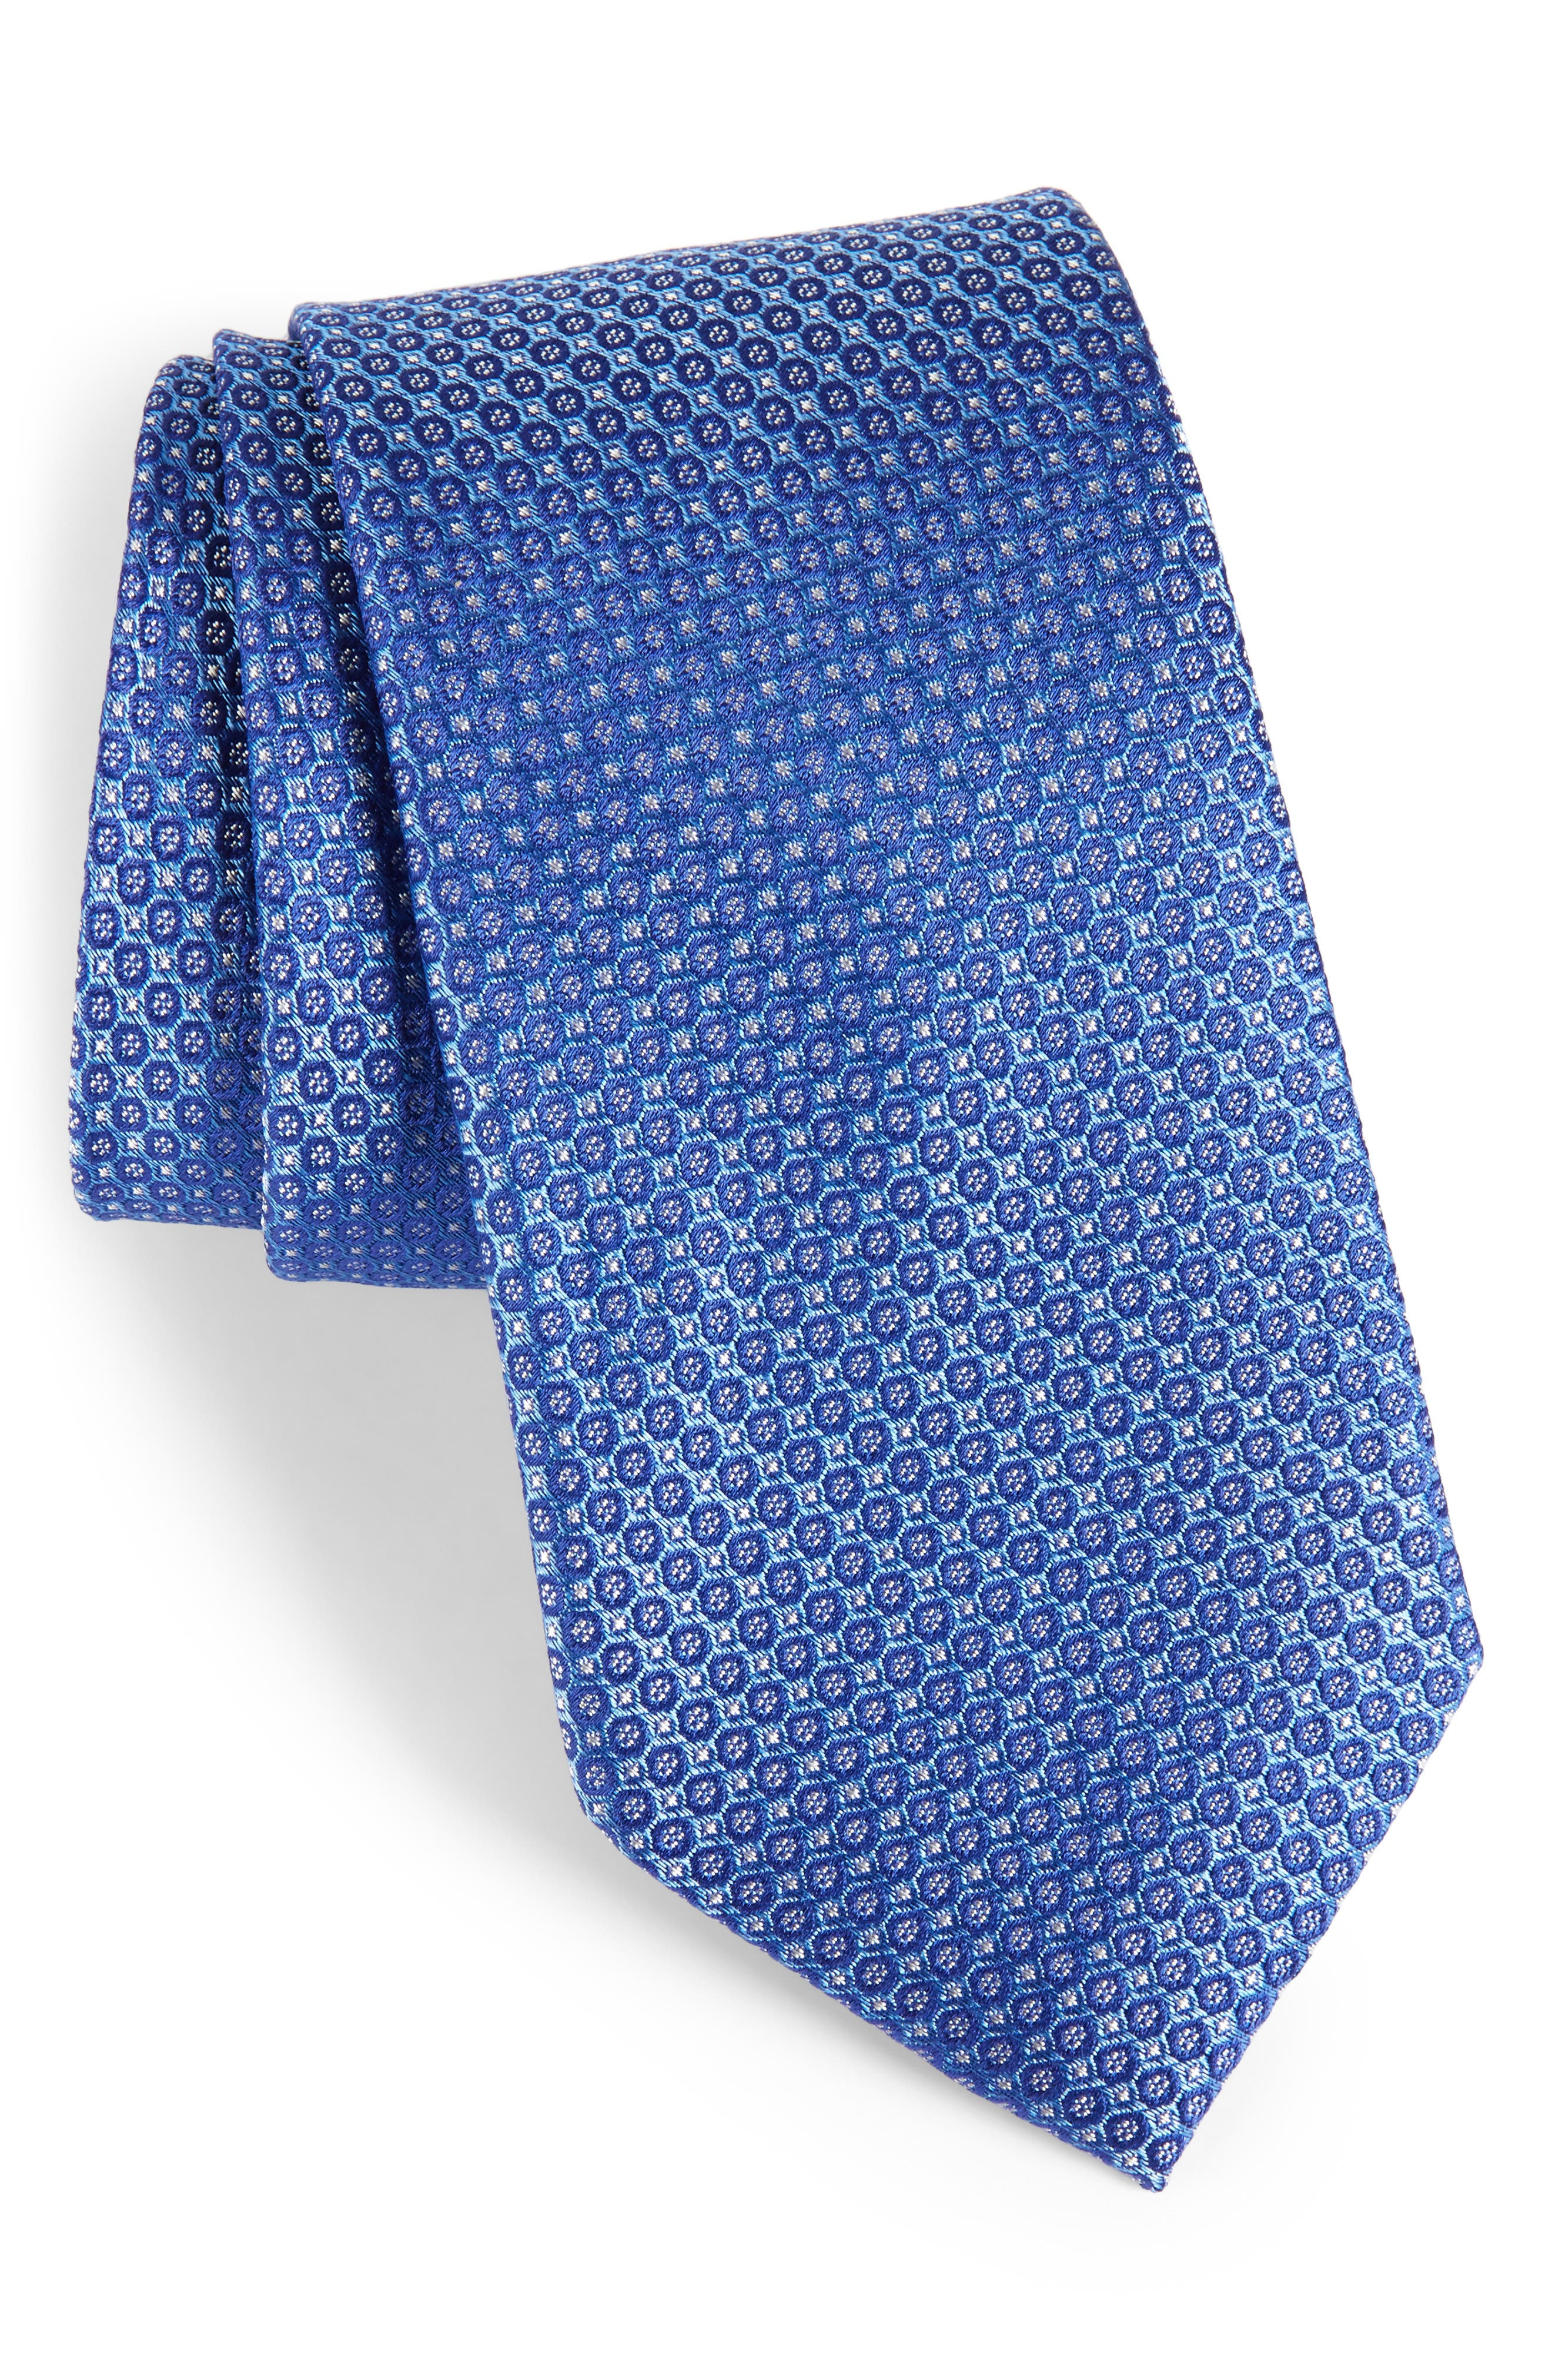 Park Ave Solid Silk Tie,                         Main,                         color, 400